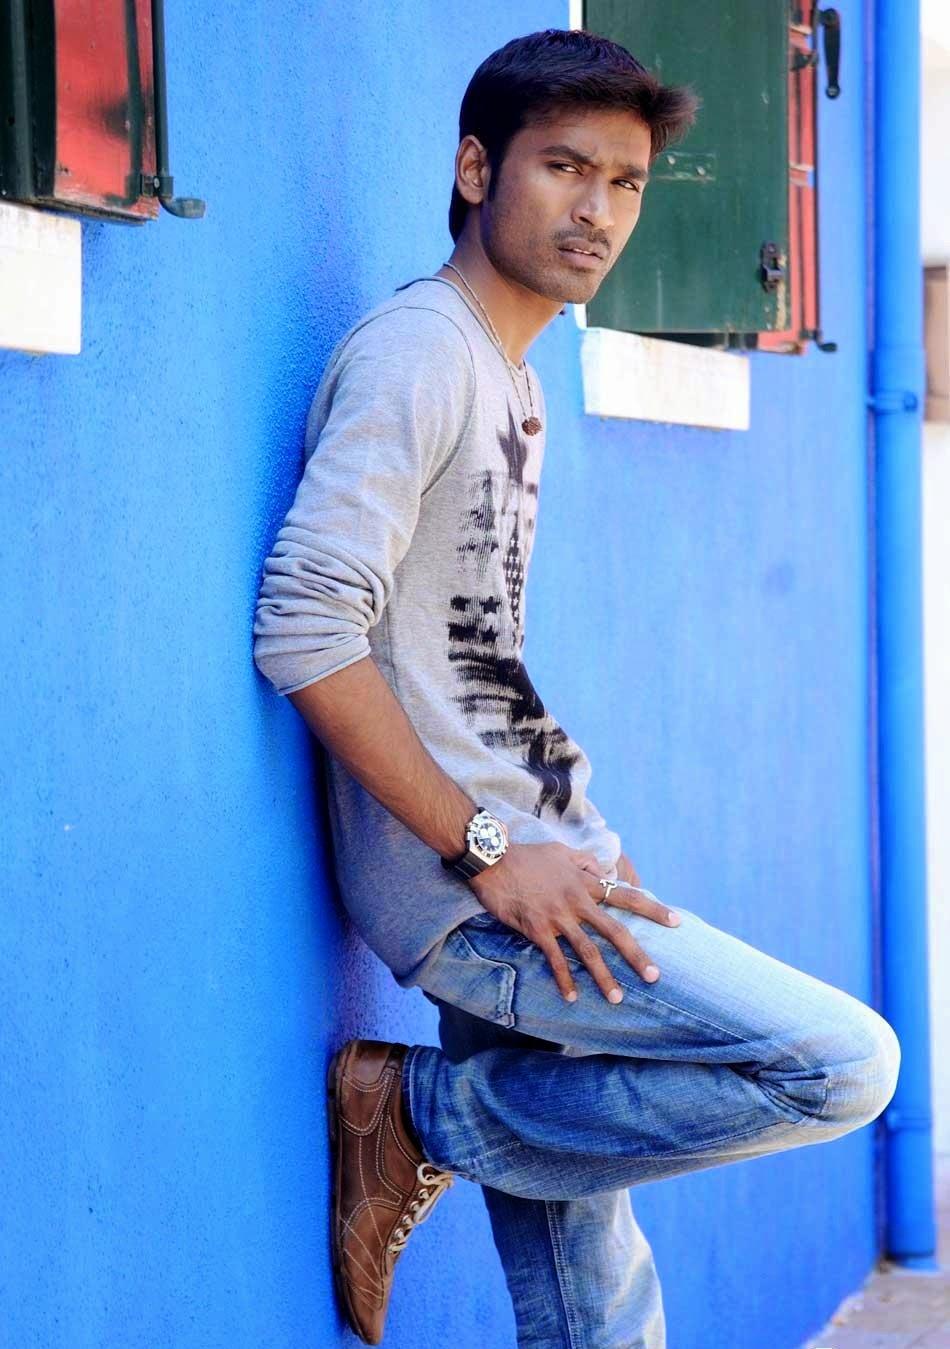 kollywood celebrities & tamil movies reviews: dhanush wallpapers